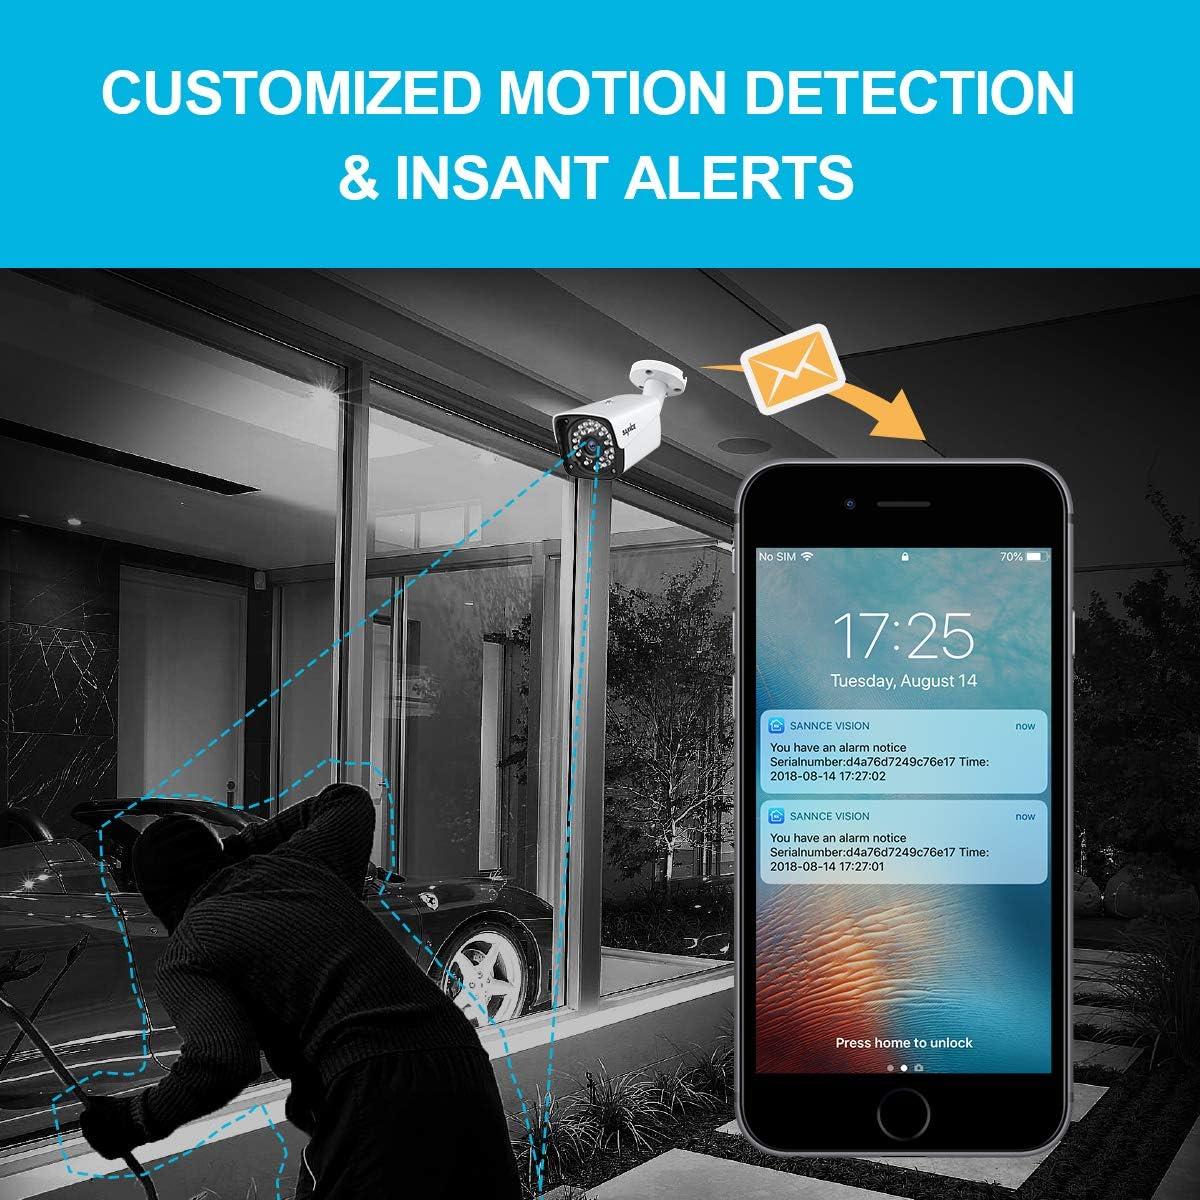 Avisos al móvil sistema de seguridad